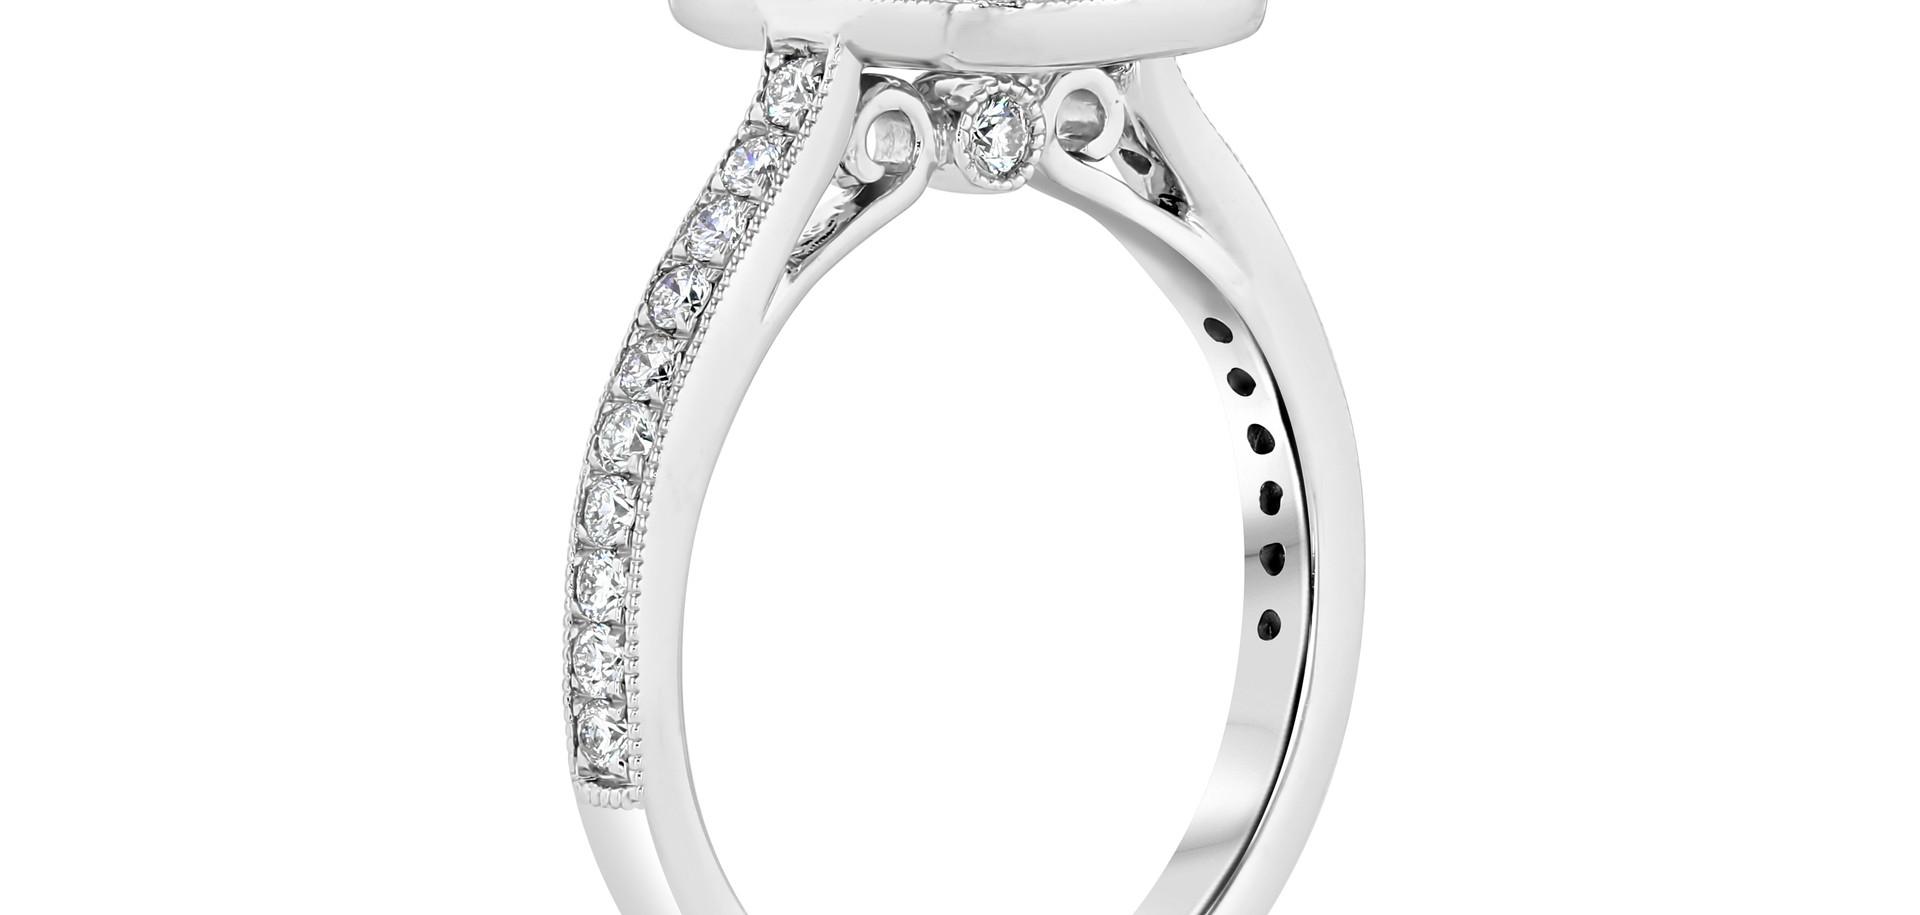 Copy of Engagement Ring 5_b0.JPG